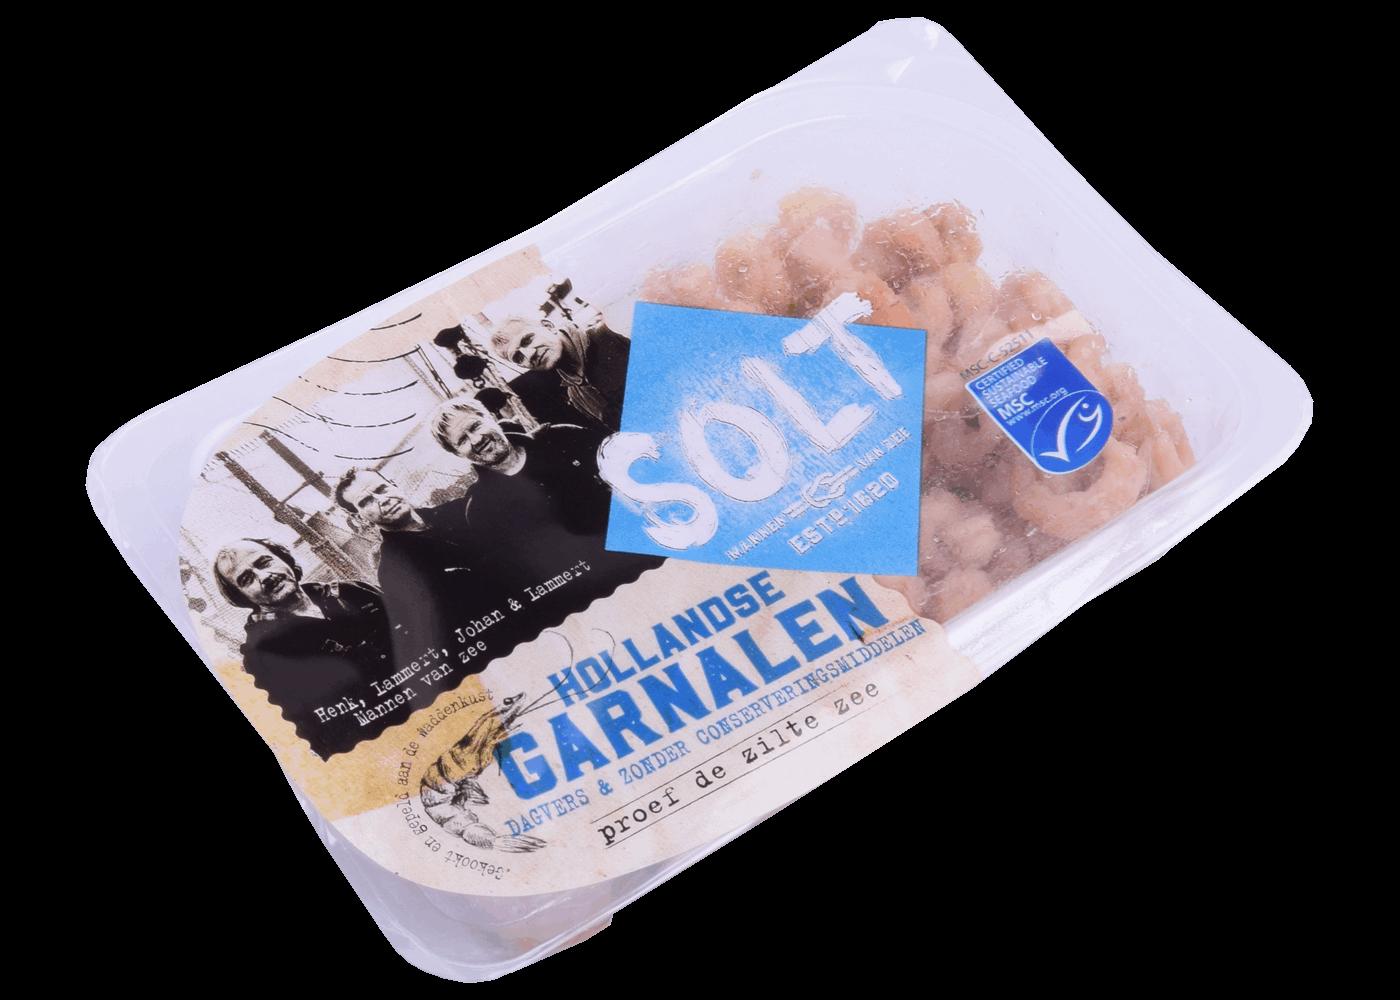 Productafbeelding SOLT HOLLANDSE GARNALEN CV 90 GRAM MSC